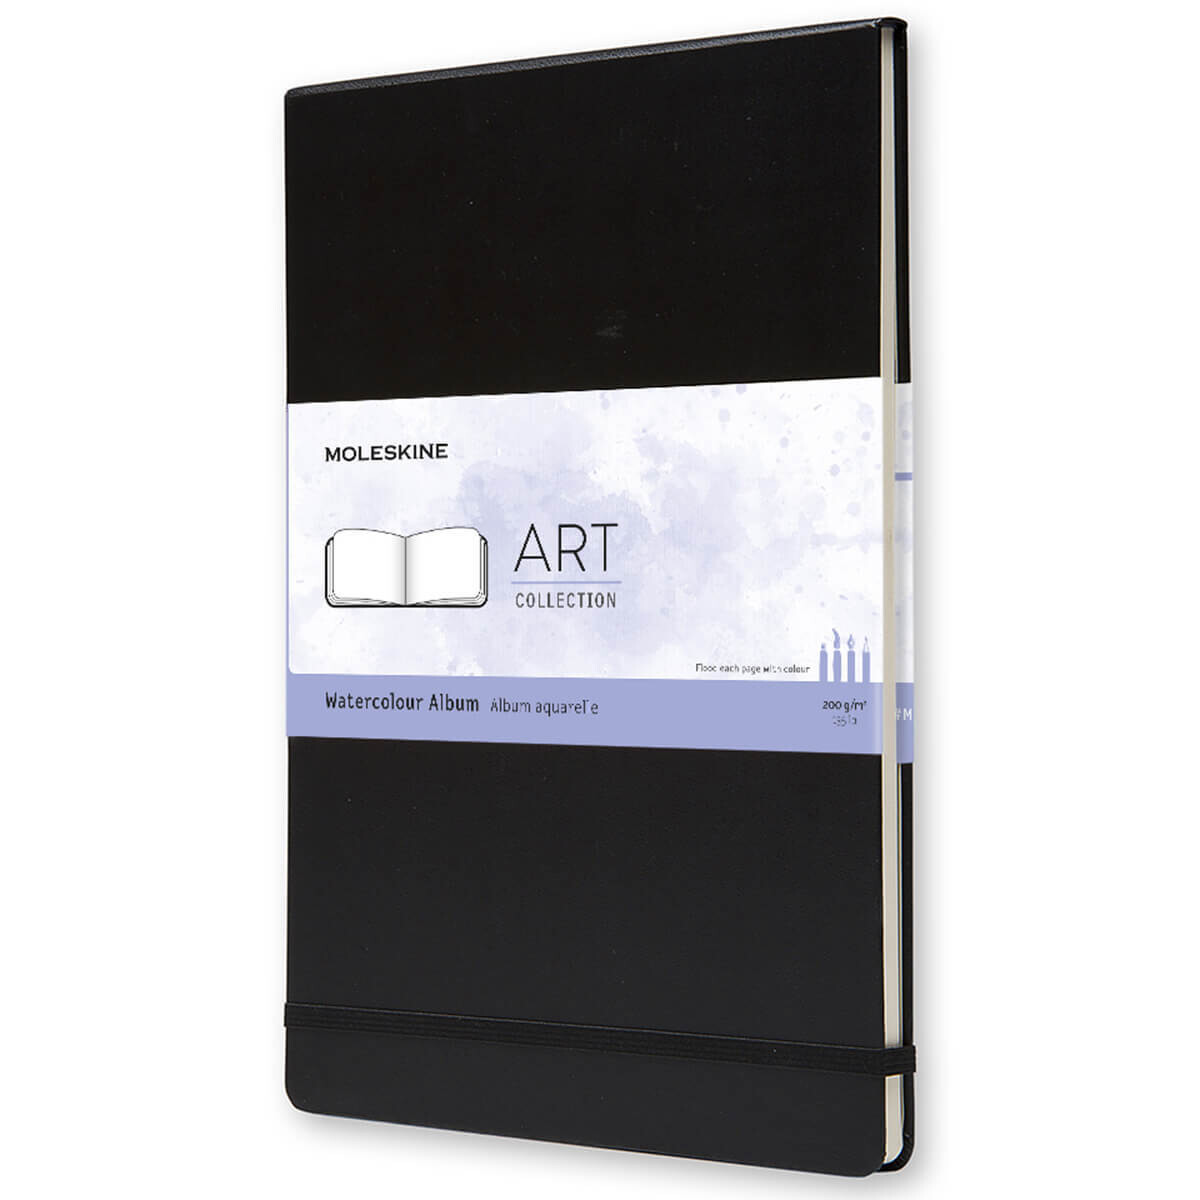 Moleskine Art Watercolour Album A4